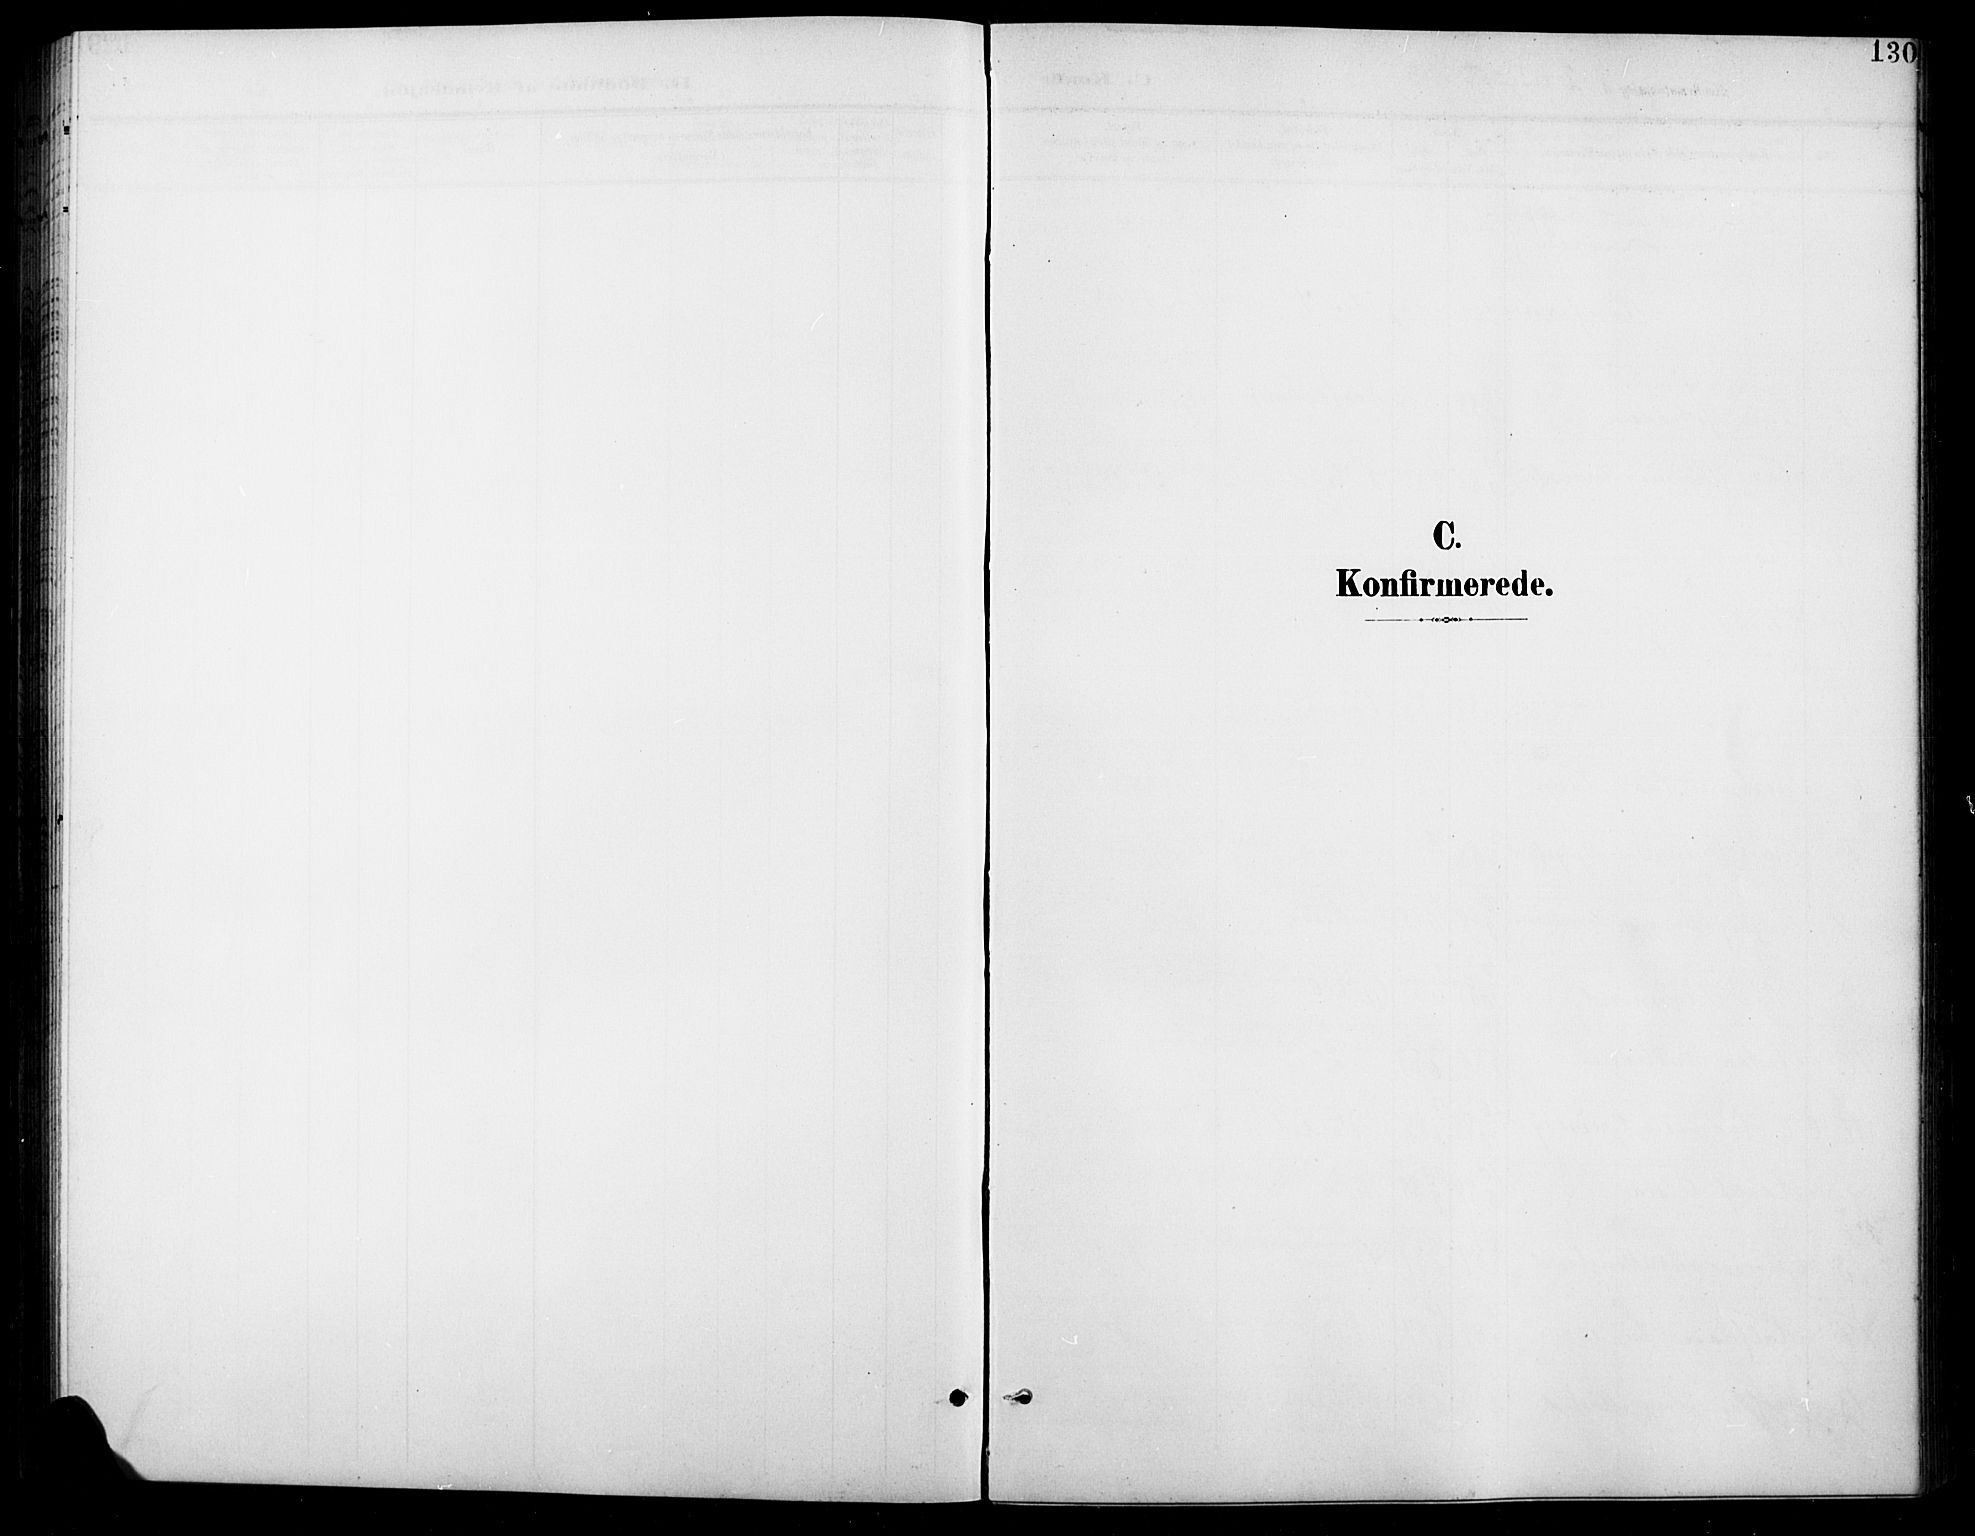 SAH, Vardal prestekontor, H/Ha/Hab/L0012: Klokkerbok nr. 12, 1902-1911, s. 130